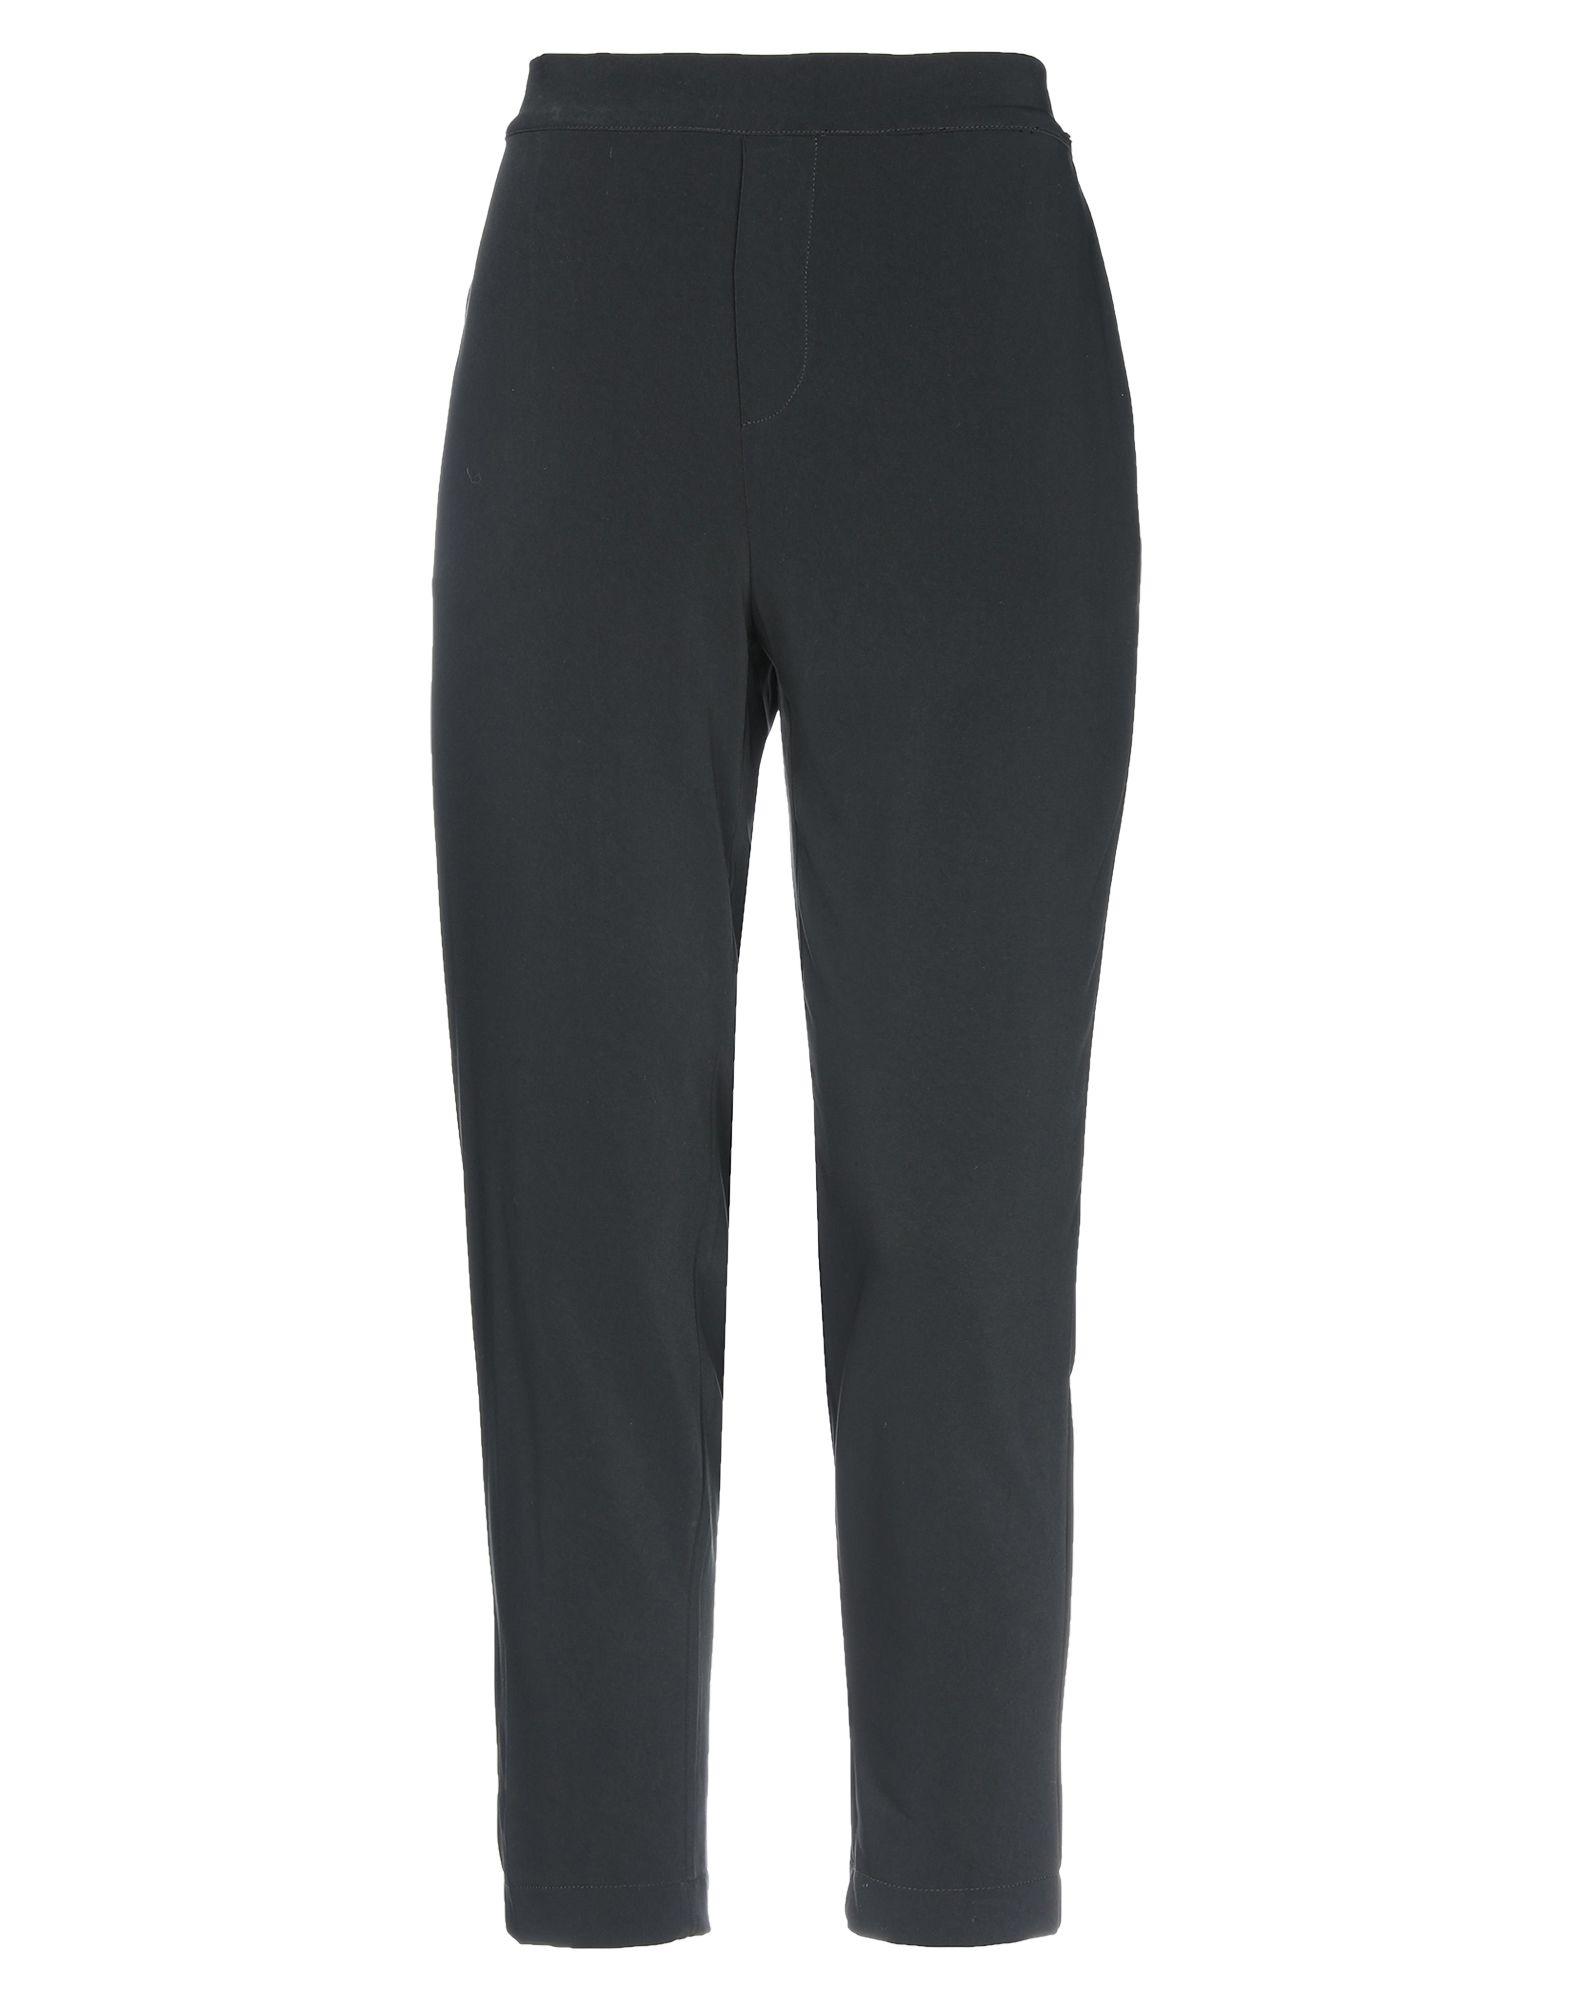 Pantalone Pantalone Pantalone Guess donna - 13364089TA d14